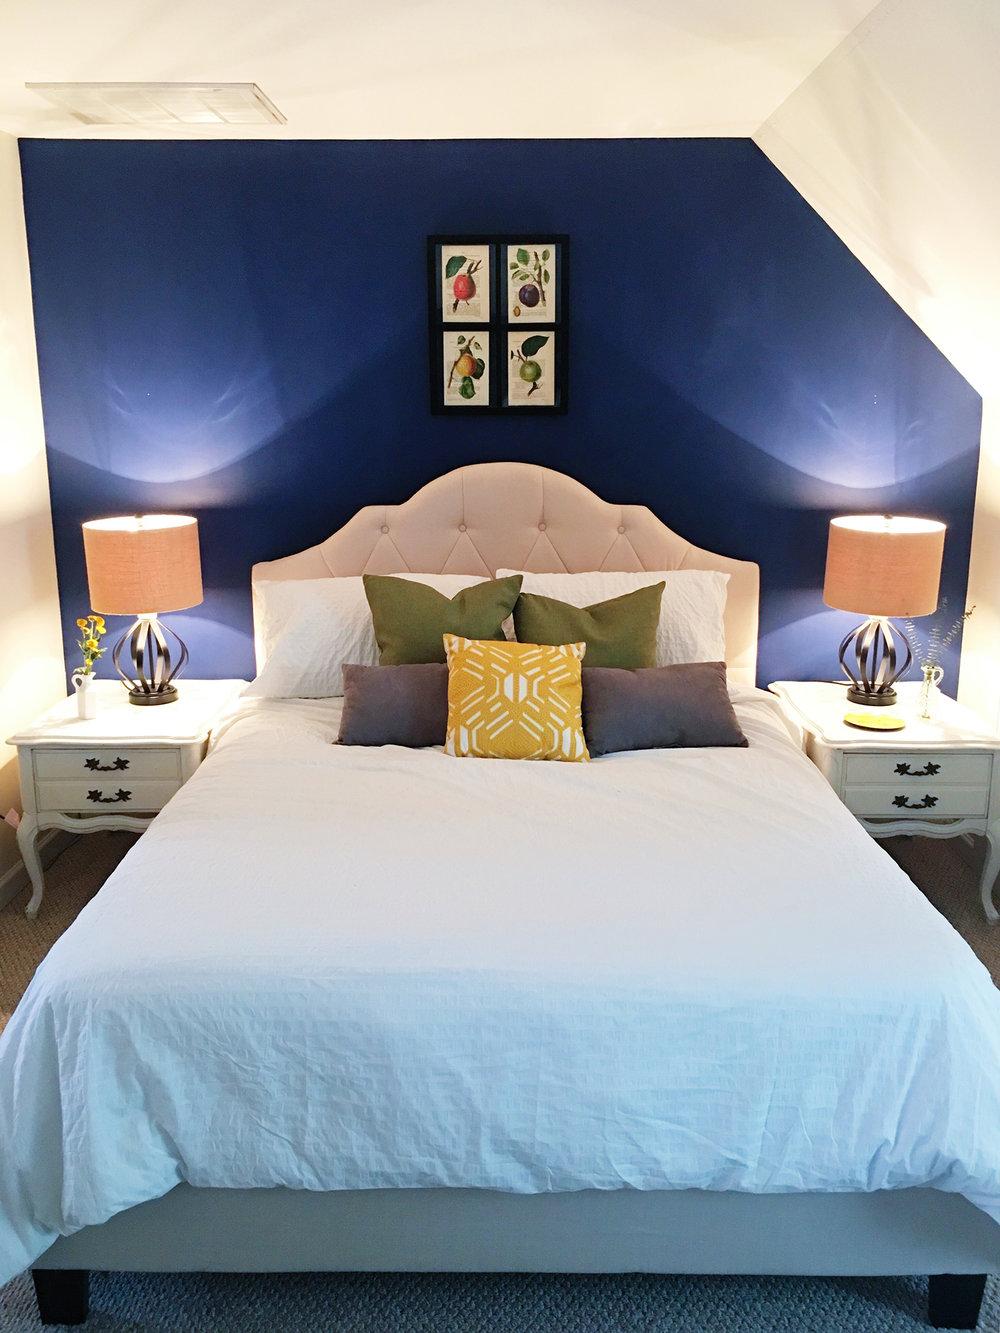 jo-torrijos-a-simpler-design-airbnb-styling-24.jpg